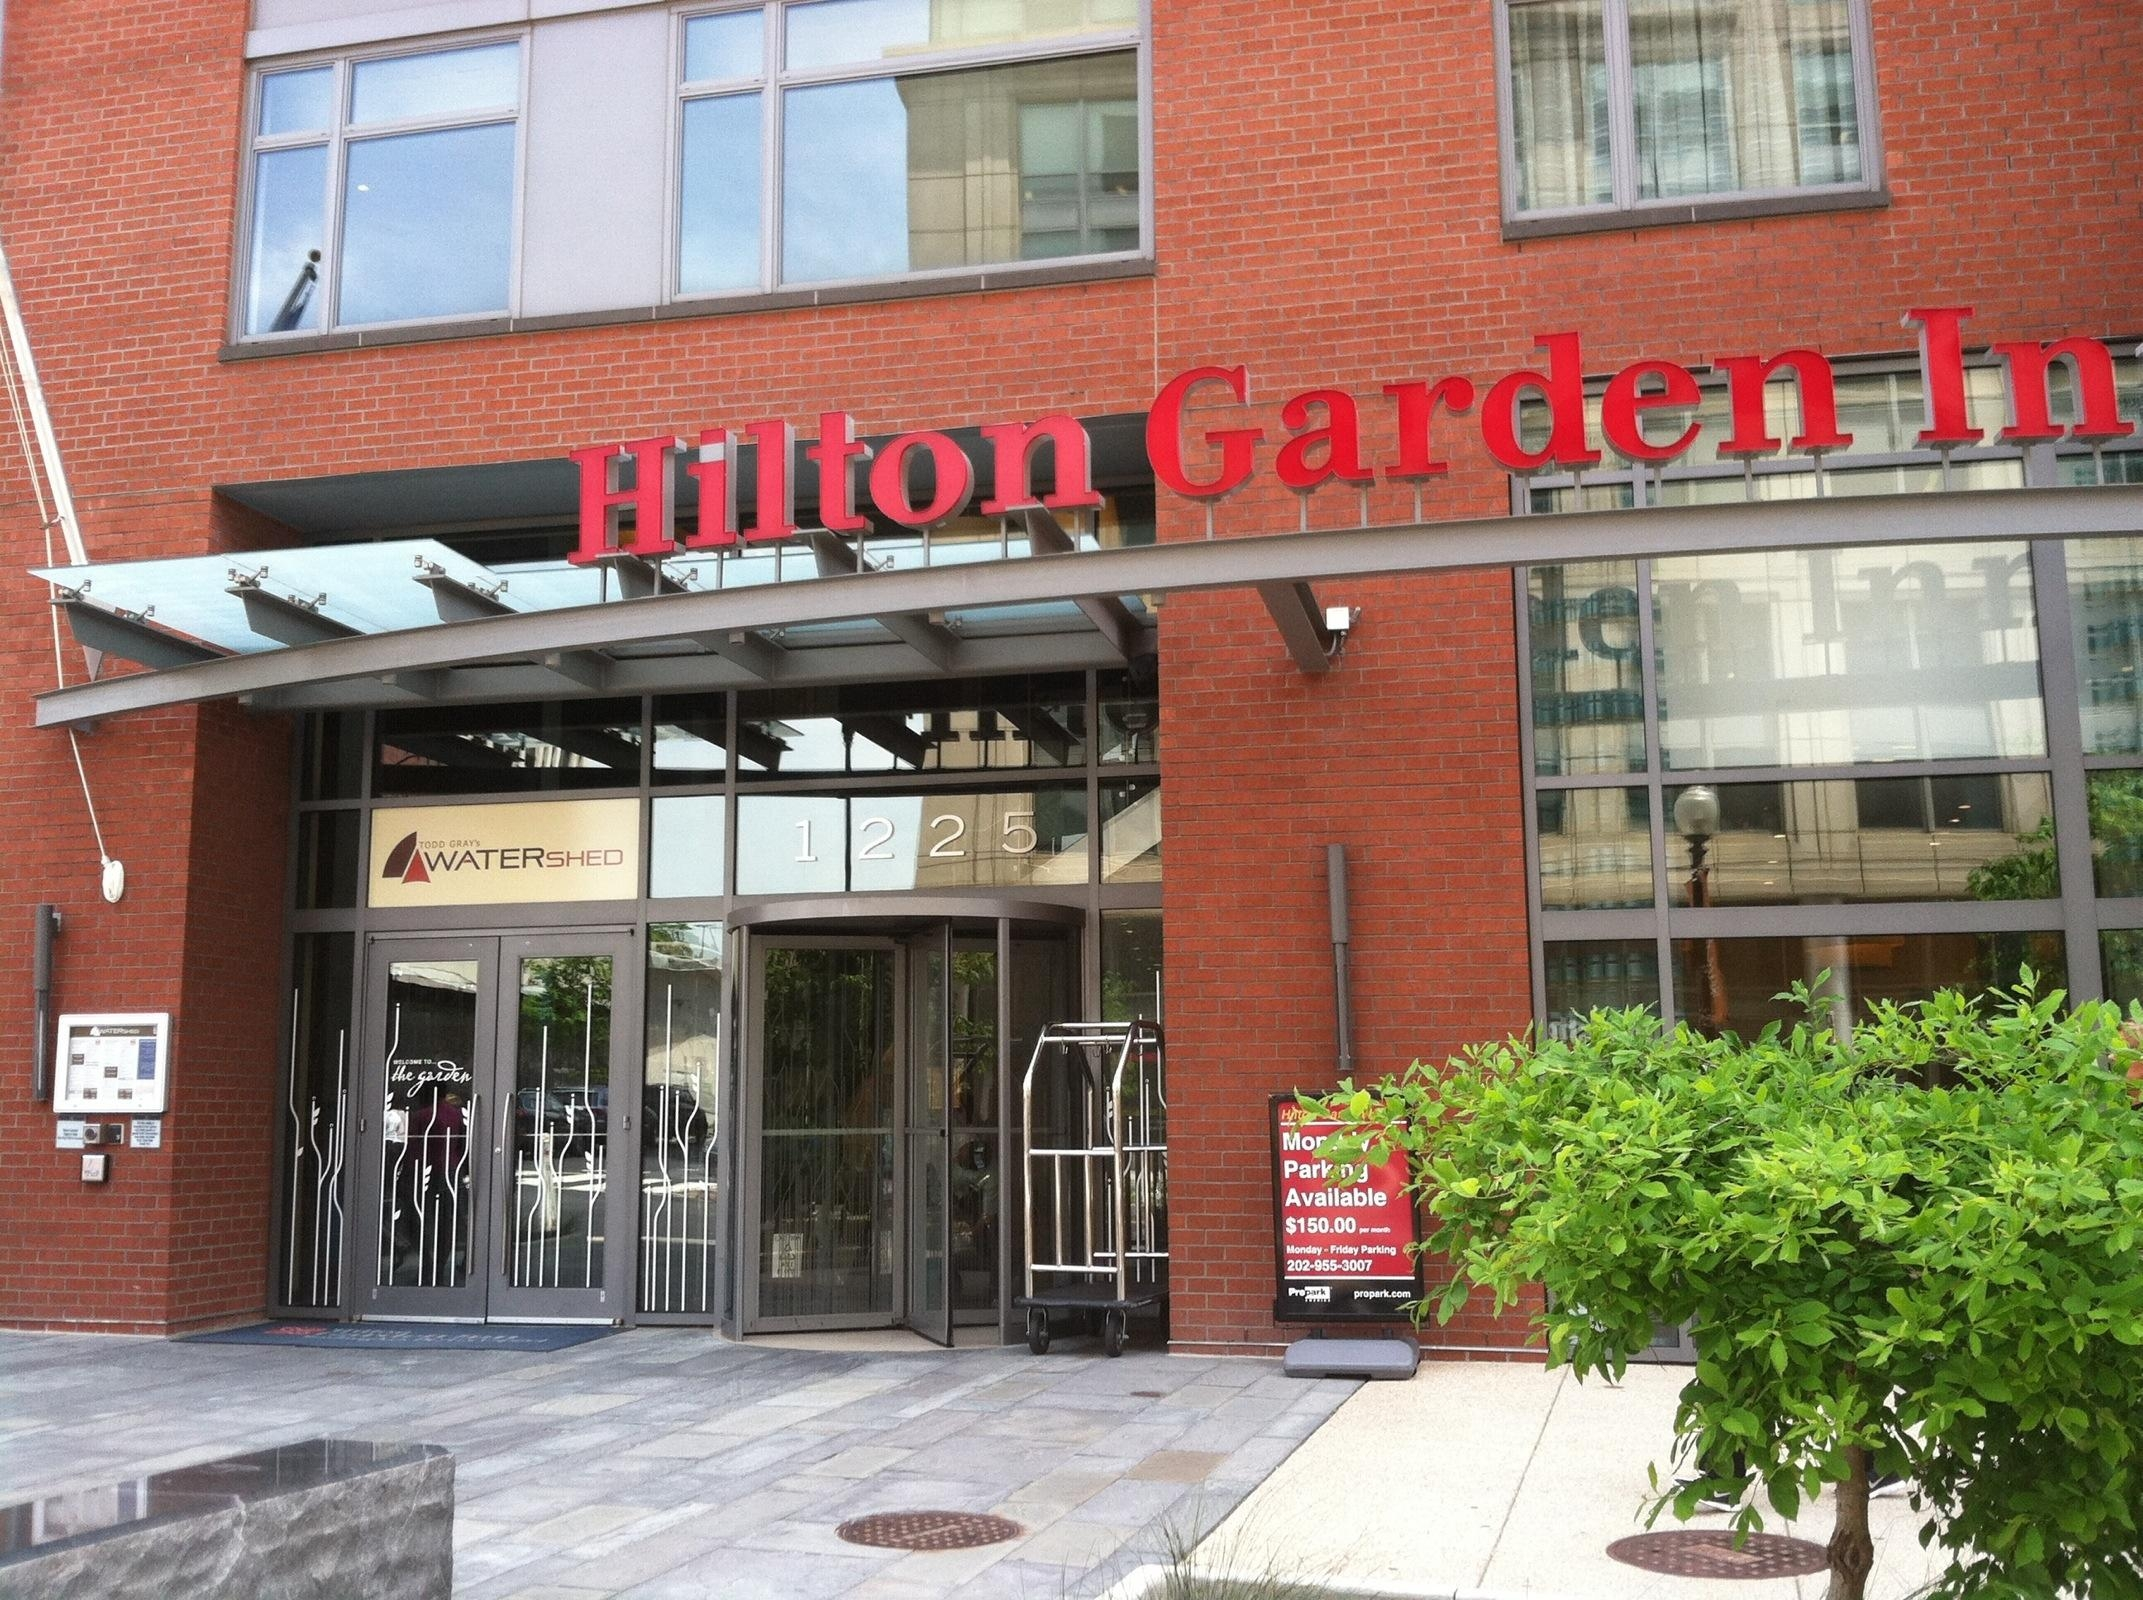 Hilton Garden Inn Parking In Washington Parkme